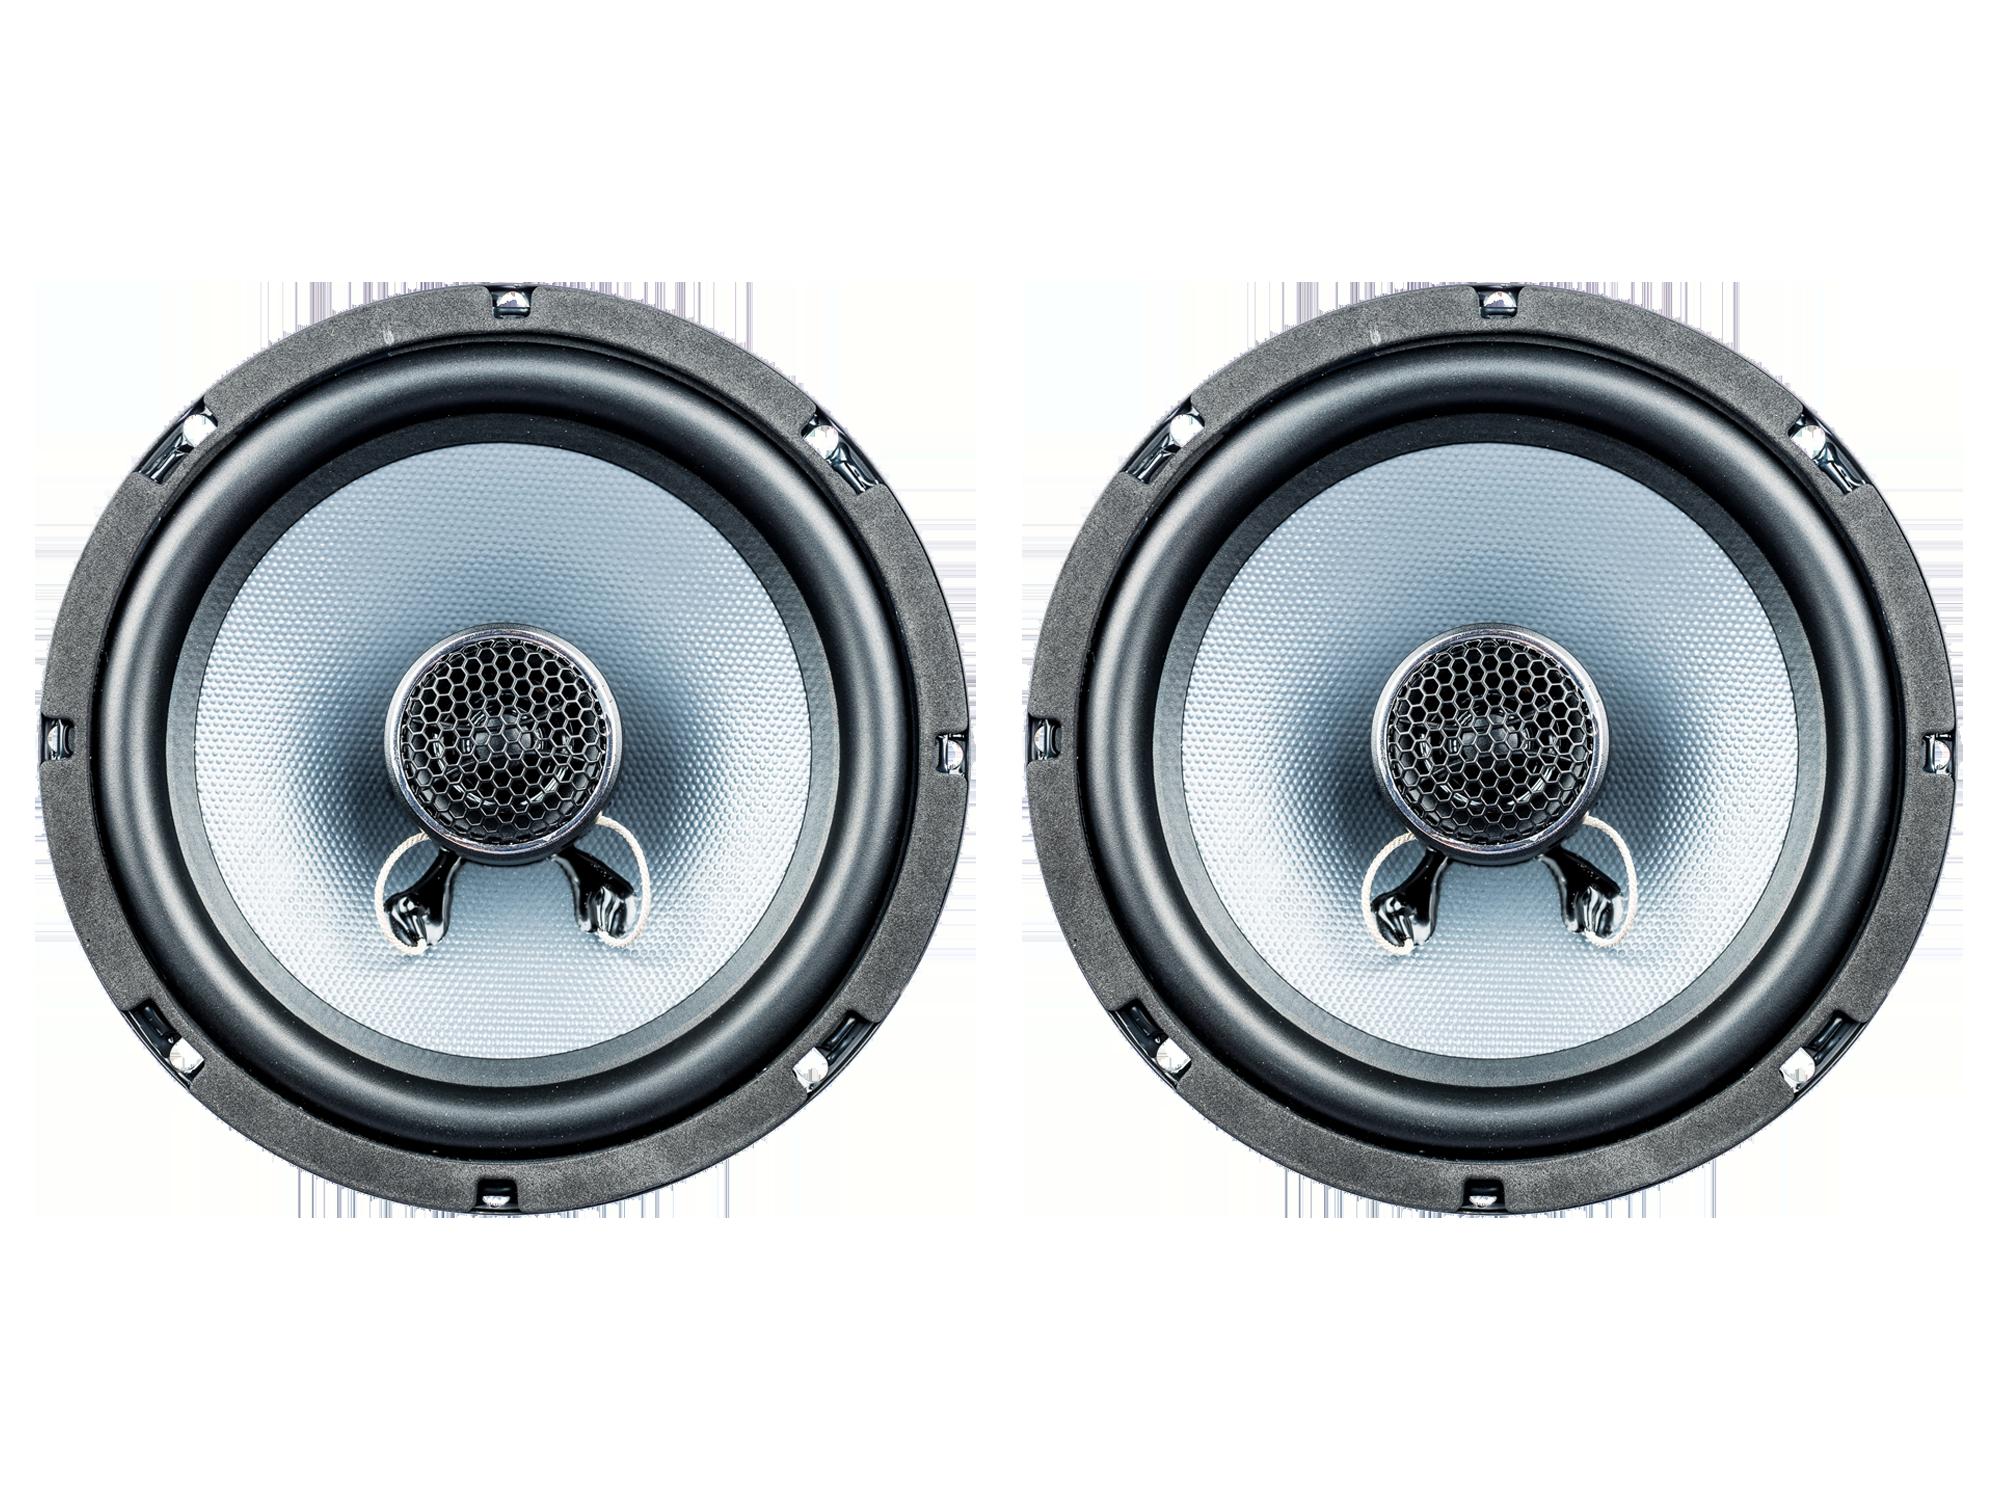 [Paket] PG Audio EVO III 16.2, 16 cm Coax  Lautsprecher Audi,BMW,Mercedes,Seat,VW